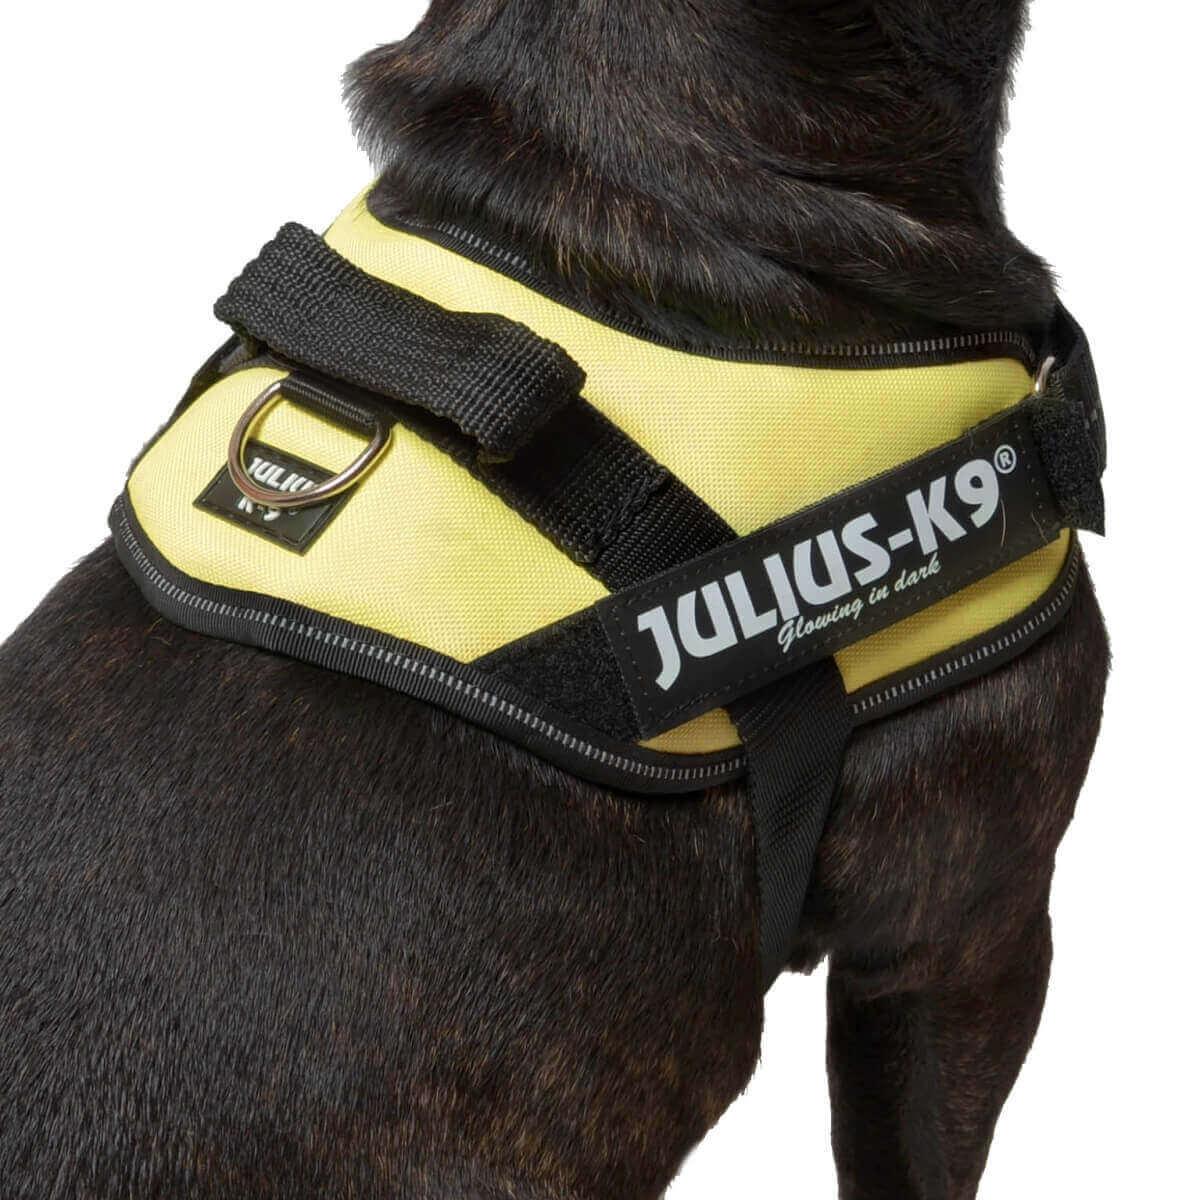 Harnais Power Julius-K9 IDC POWER jaune fluo _6